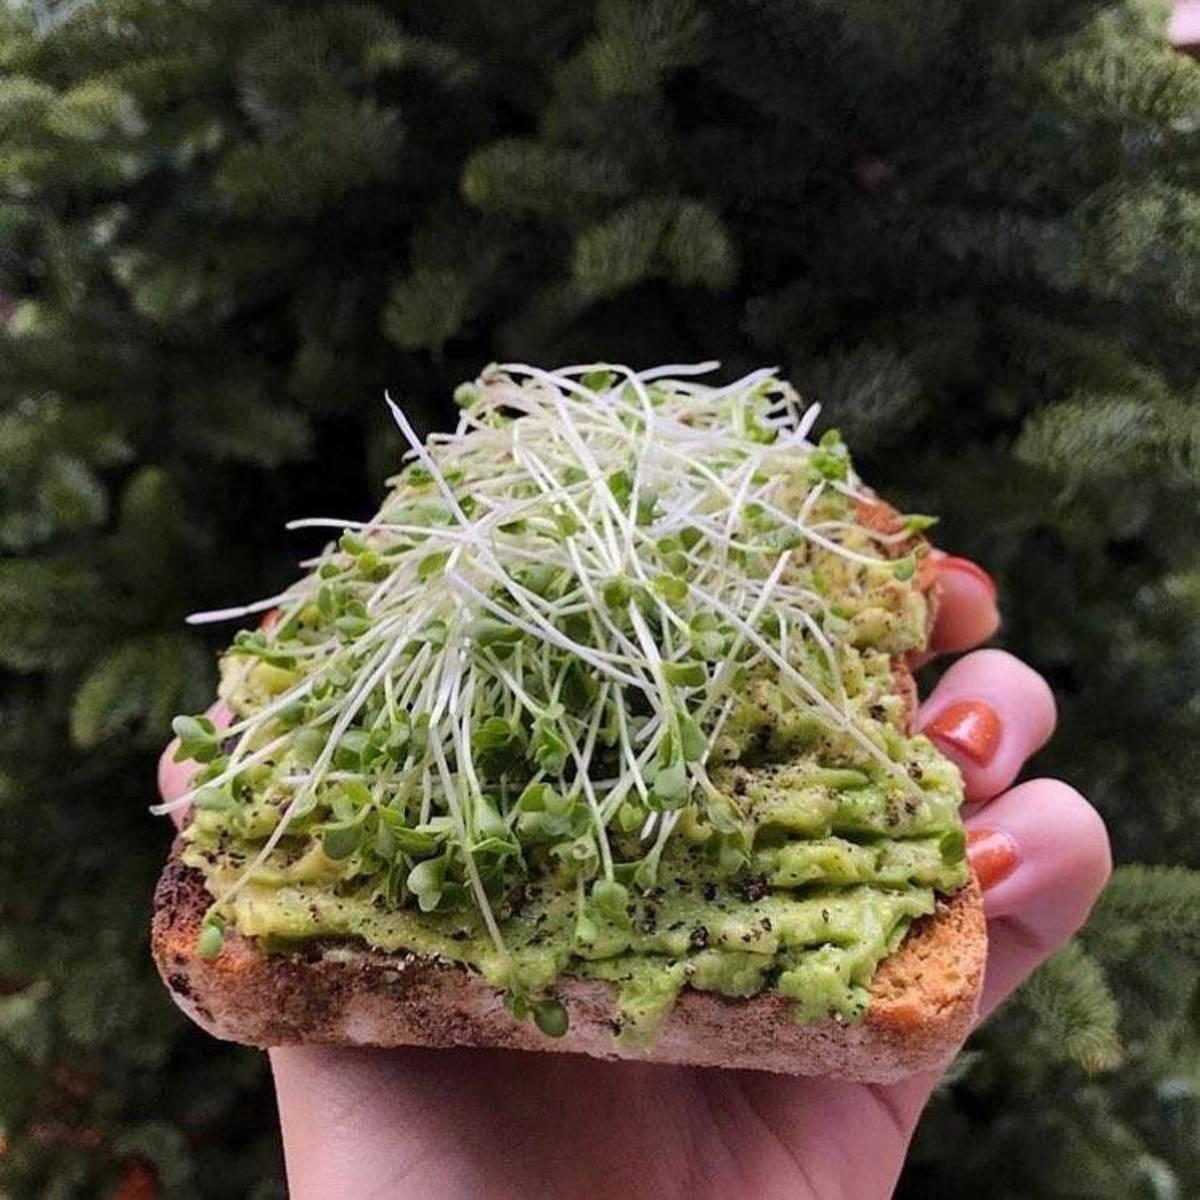 4 Grow Your Own Garden Kits to Make Quarantine Gardening Easy